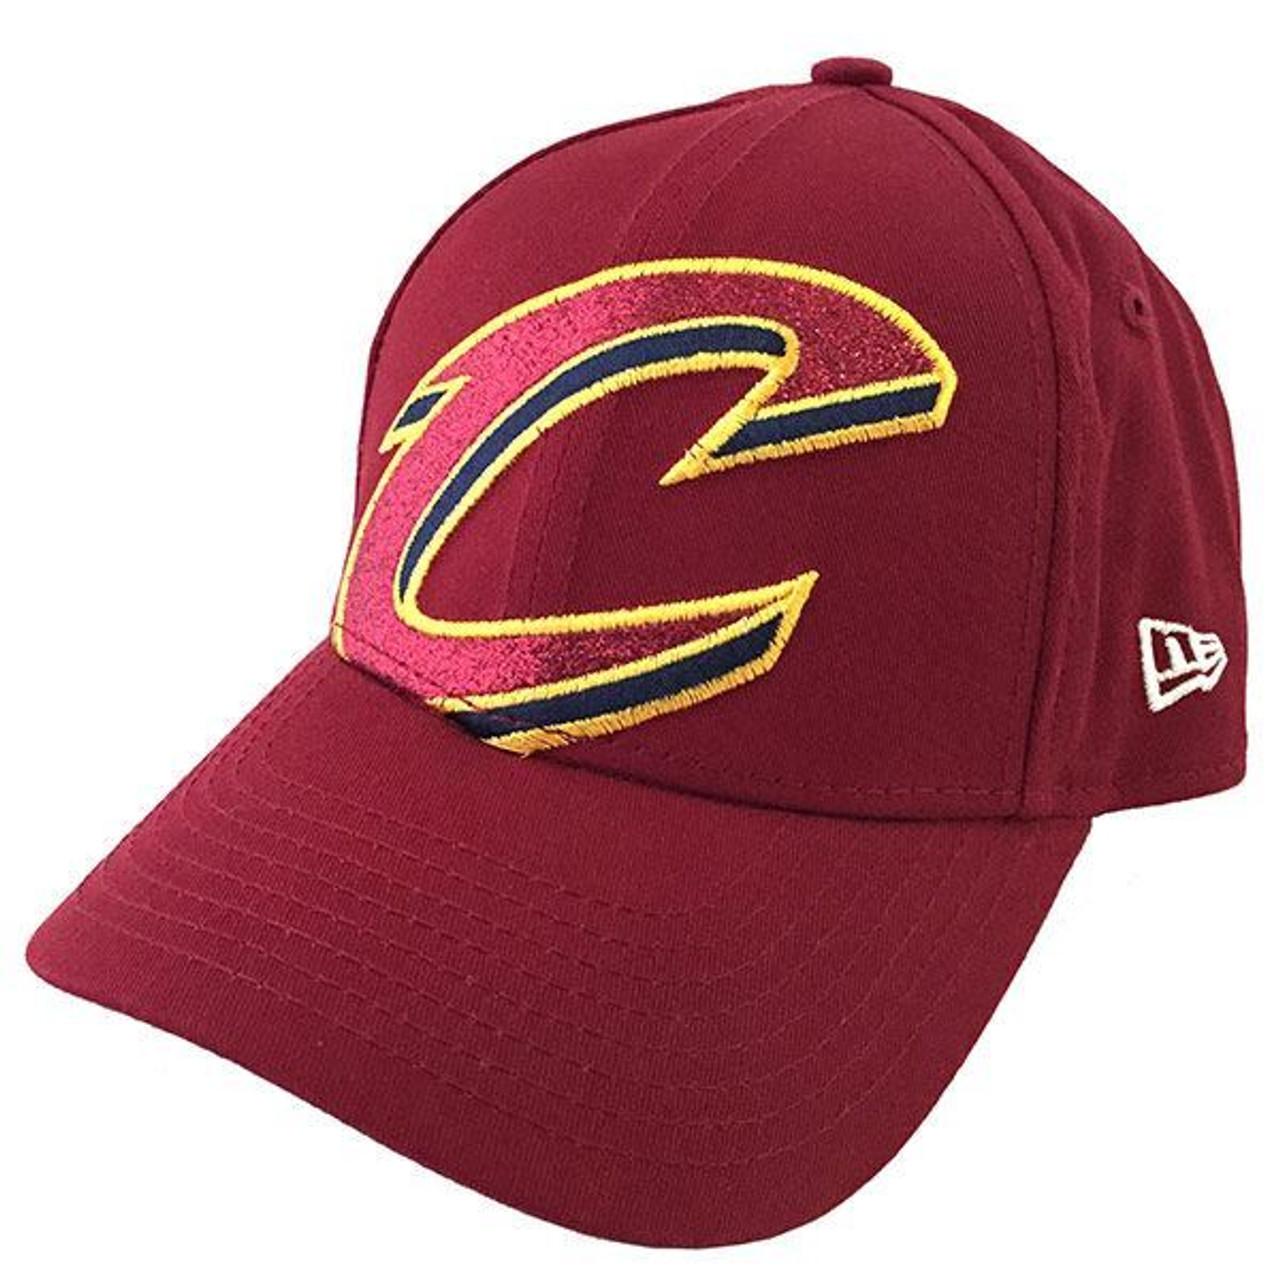 d32995dcc55 Ladies Glitter Glam Cap - Cleveland Cavaliers